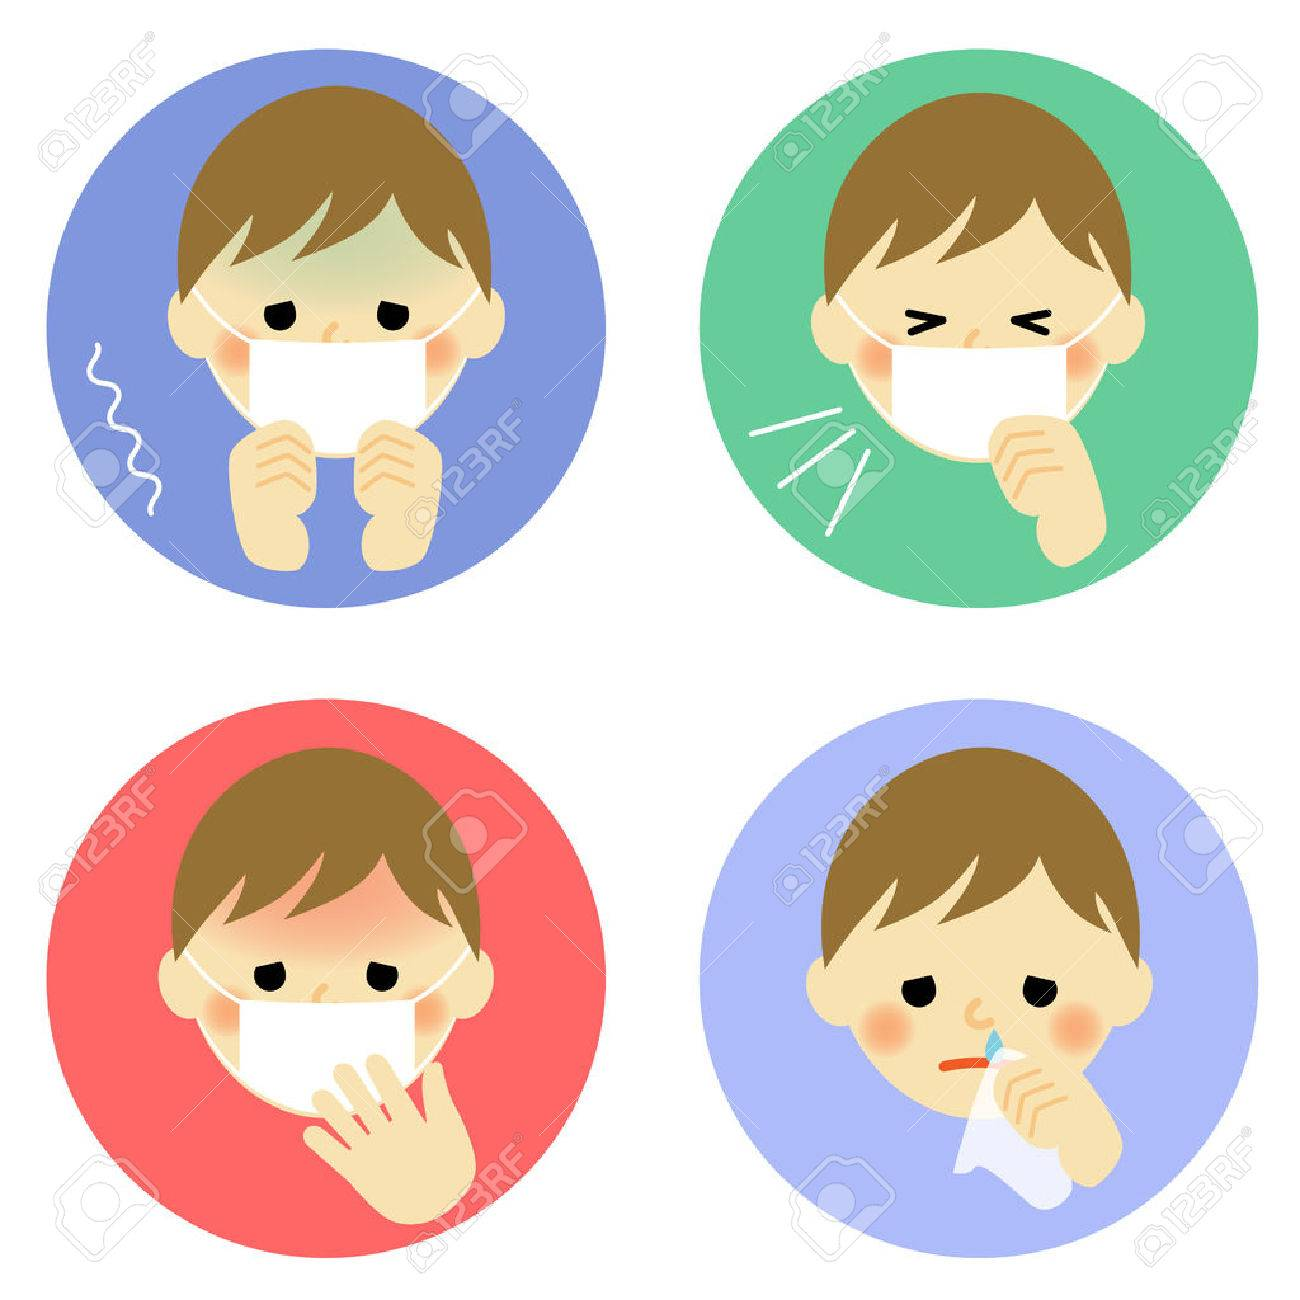 Cold symptoms of child - 34873906